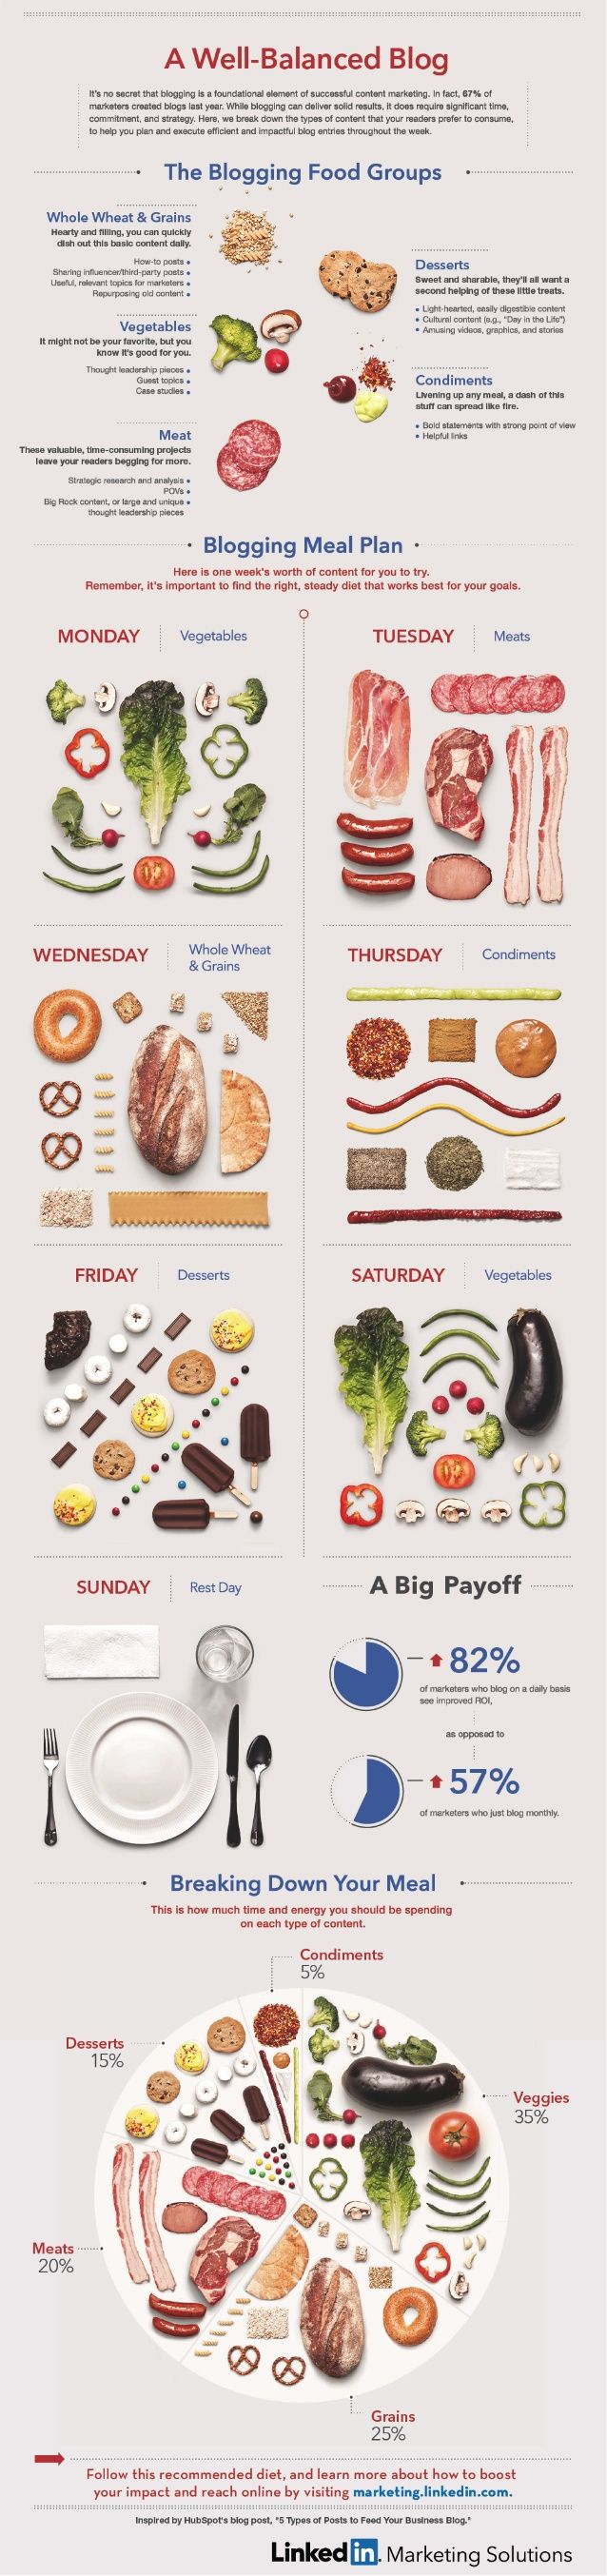 #Infografia: Un blog balanceado